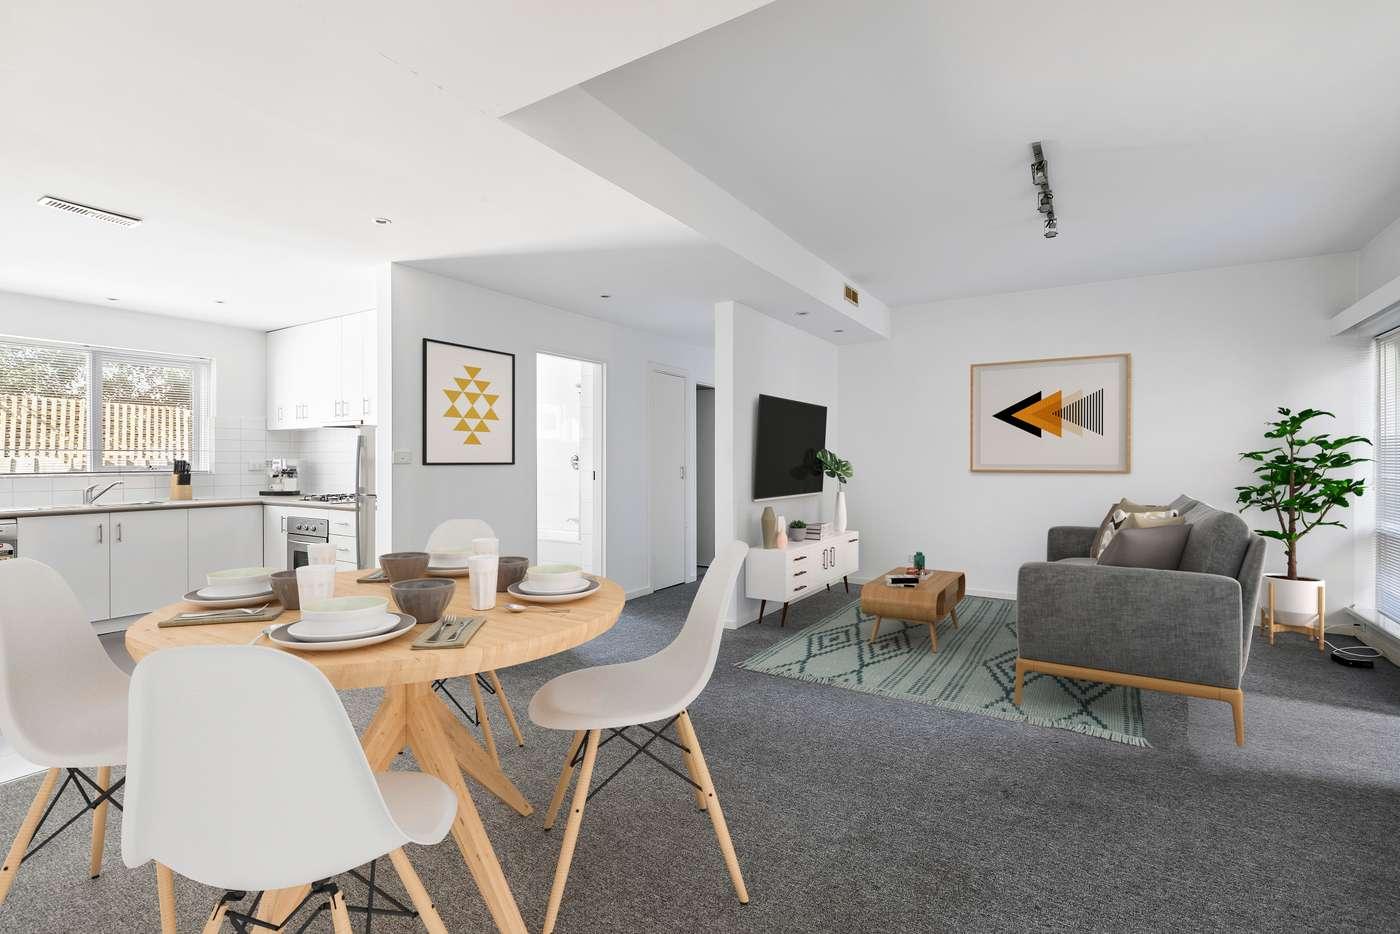 Main view of Homely apartment listing, 4/297 St Kilda Street, Brighton VIC 3186